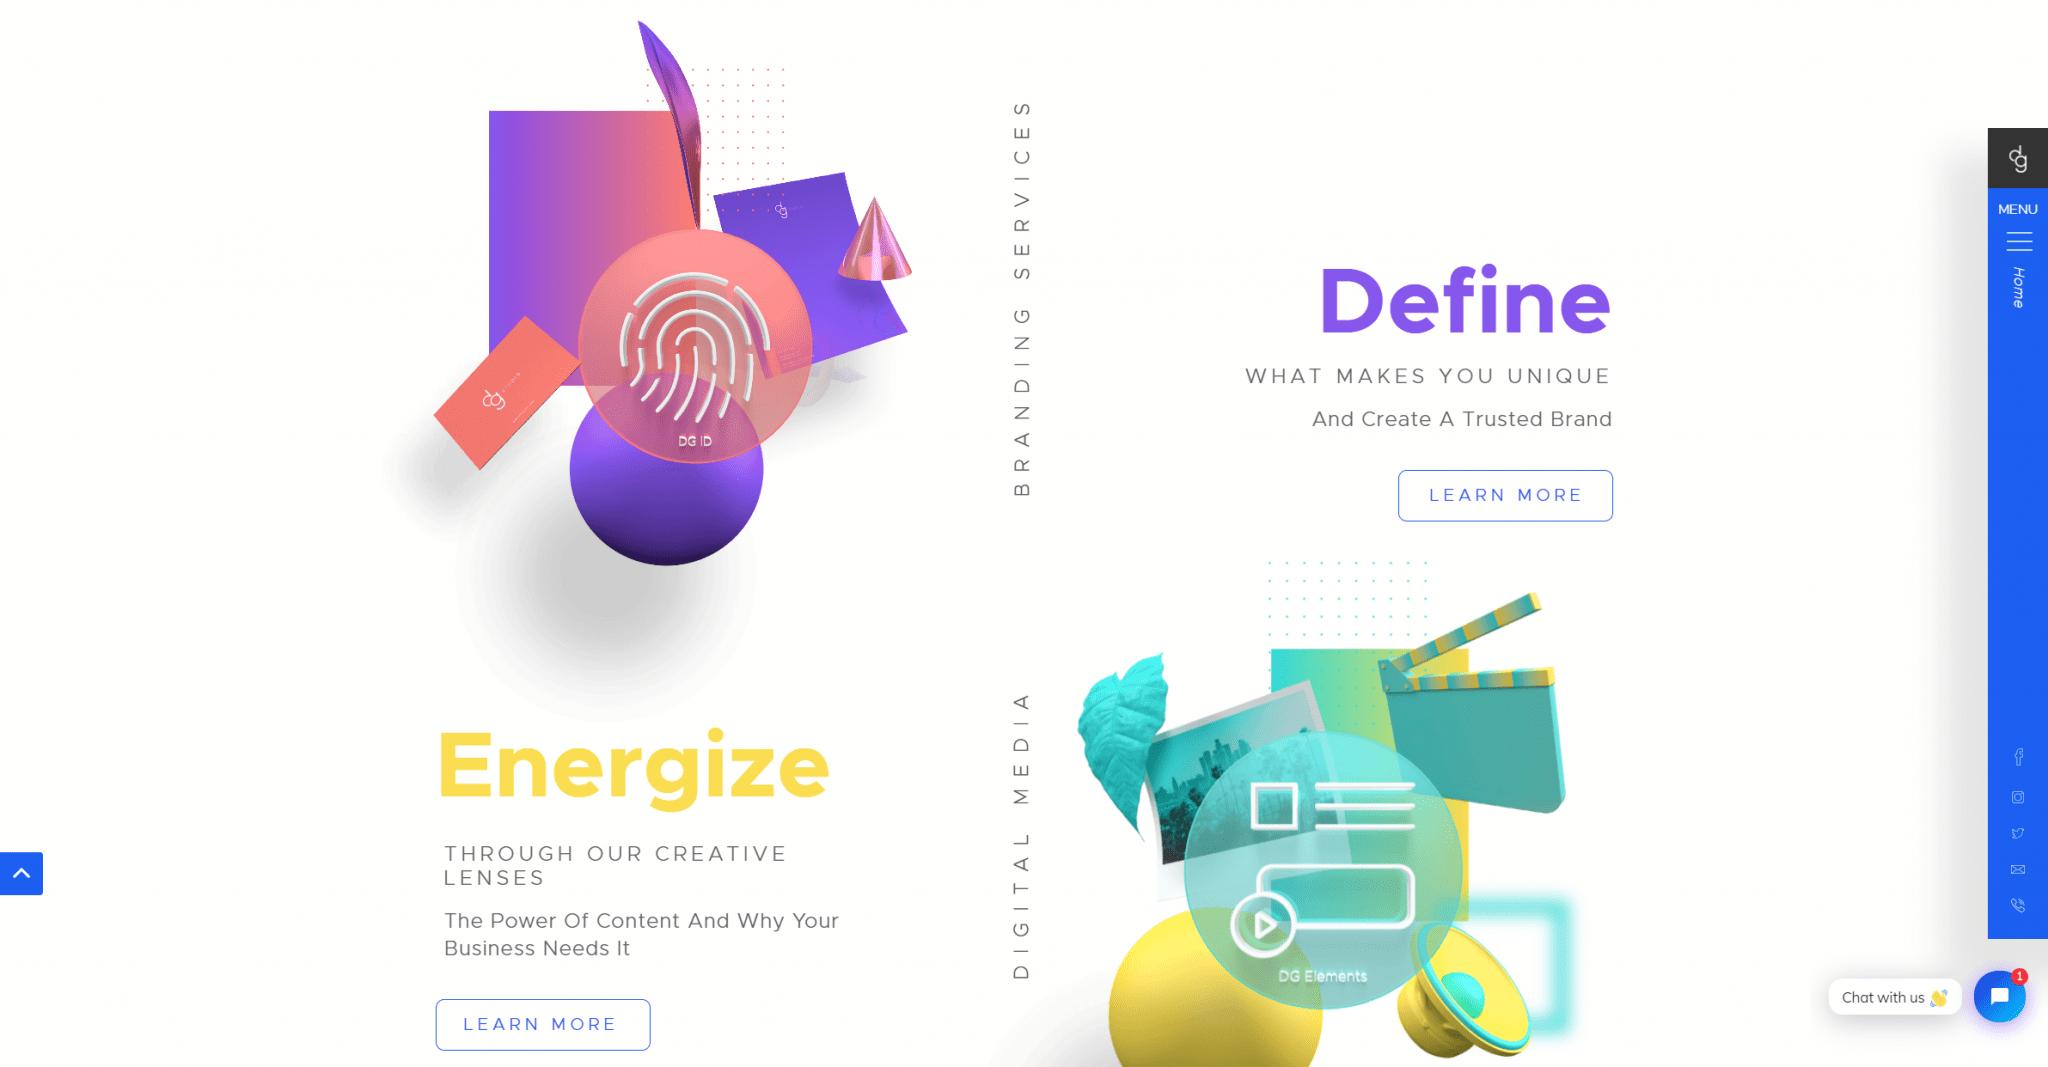 https___www.dgstudio.com_ Digital Marketing Agency Based in Los Angeles – DG Studio_002